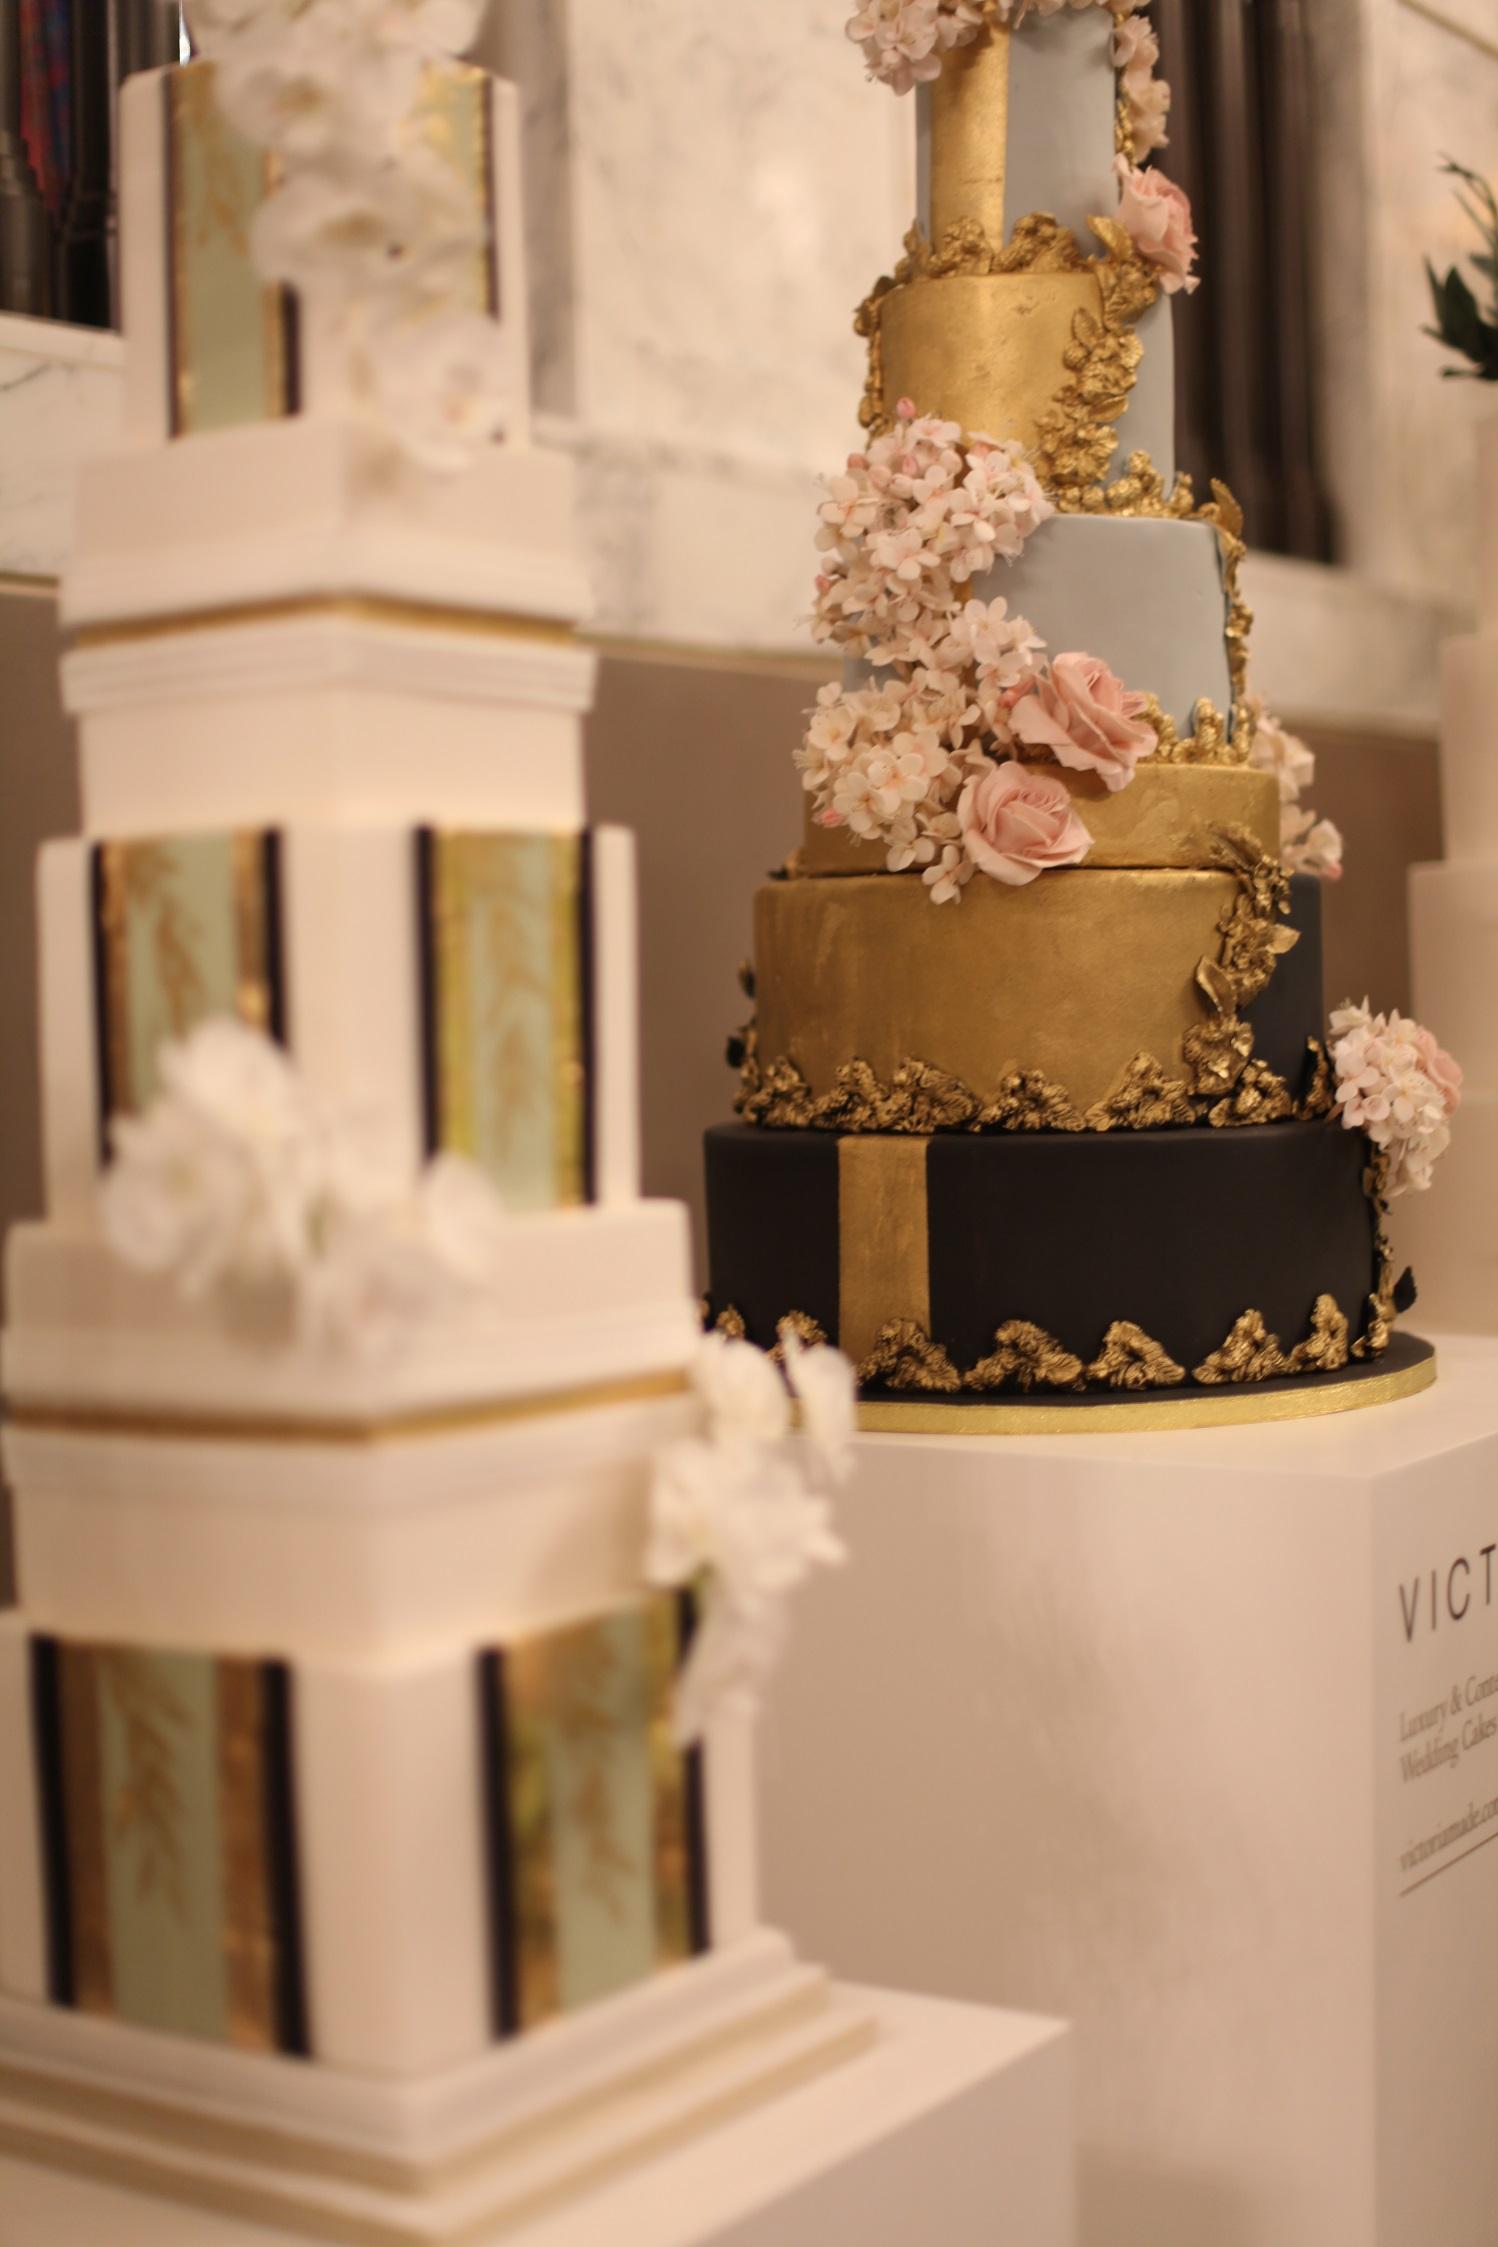 Victoria Made Wedding Cake (6).jpg